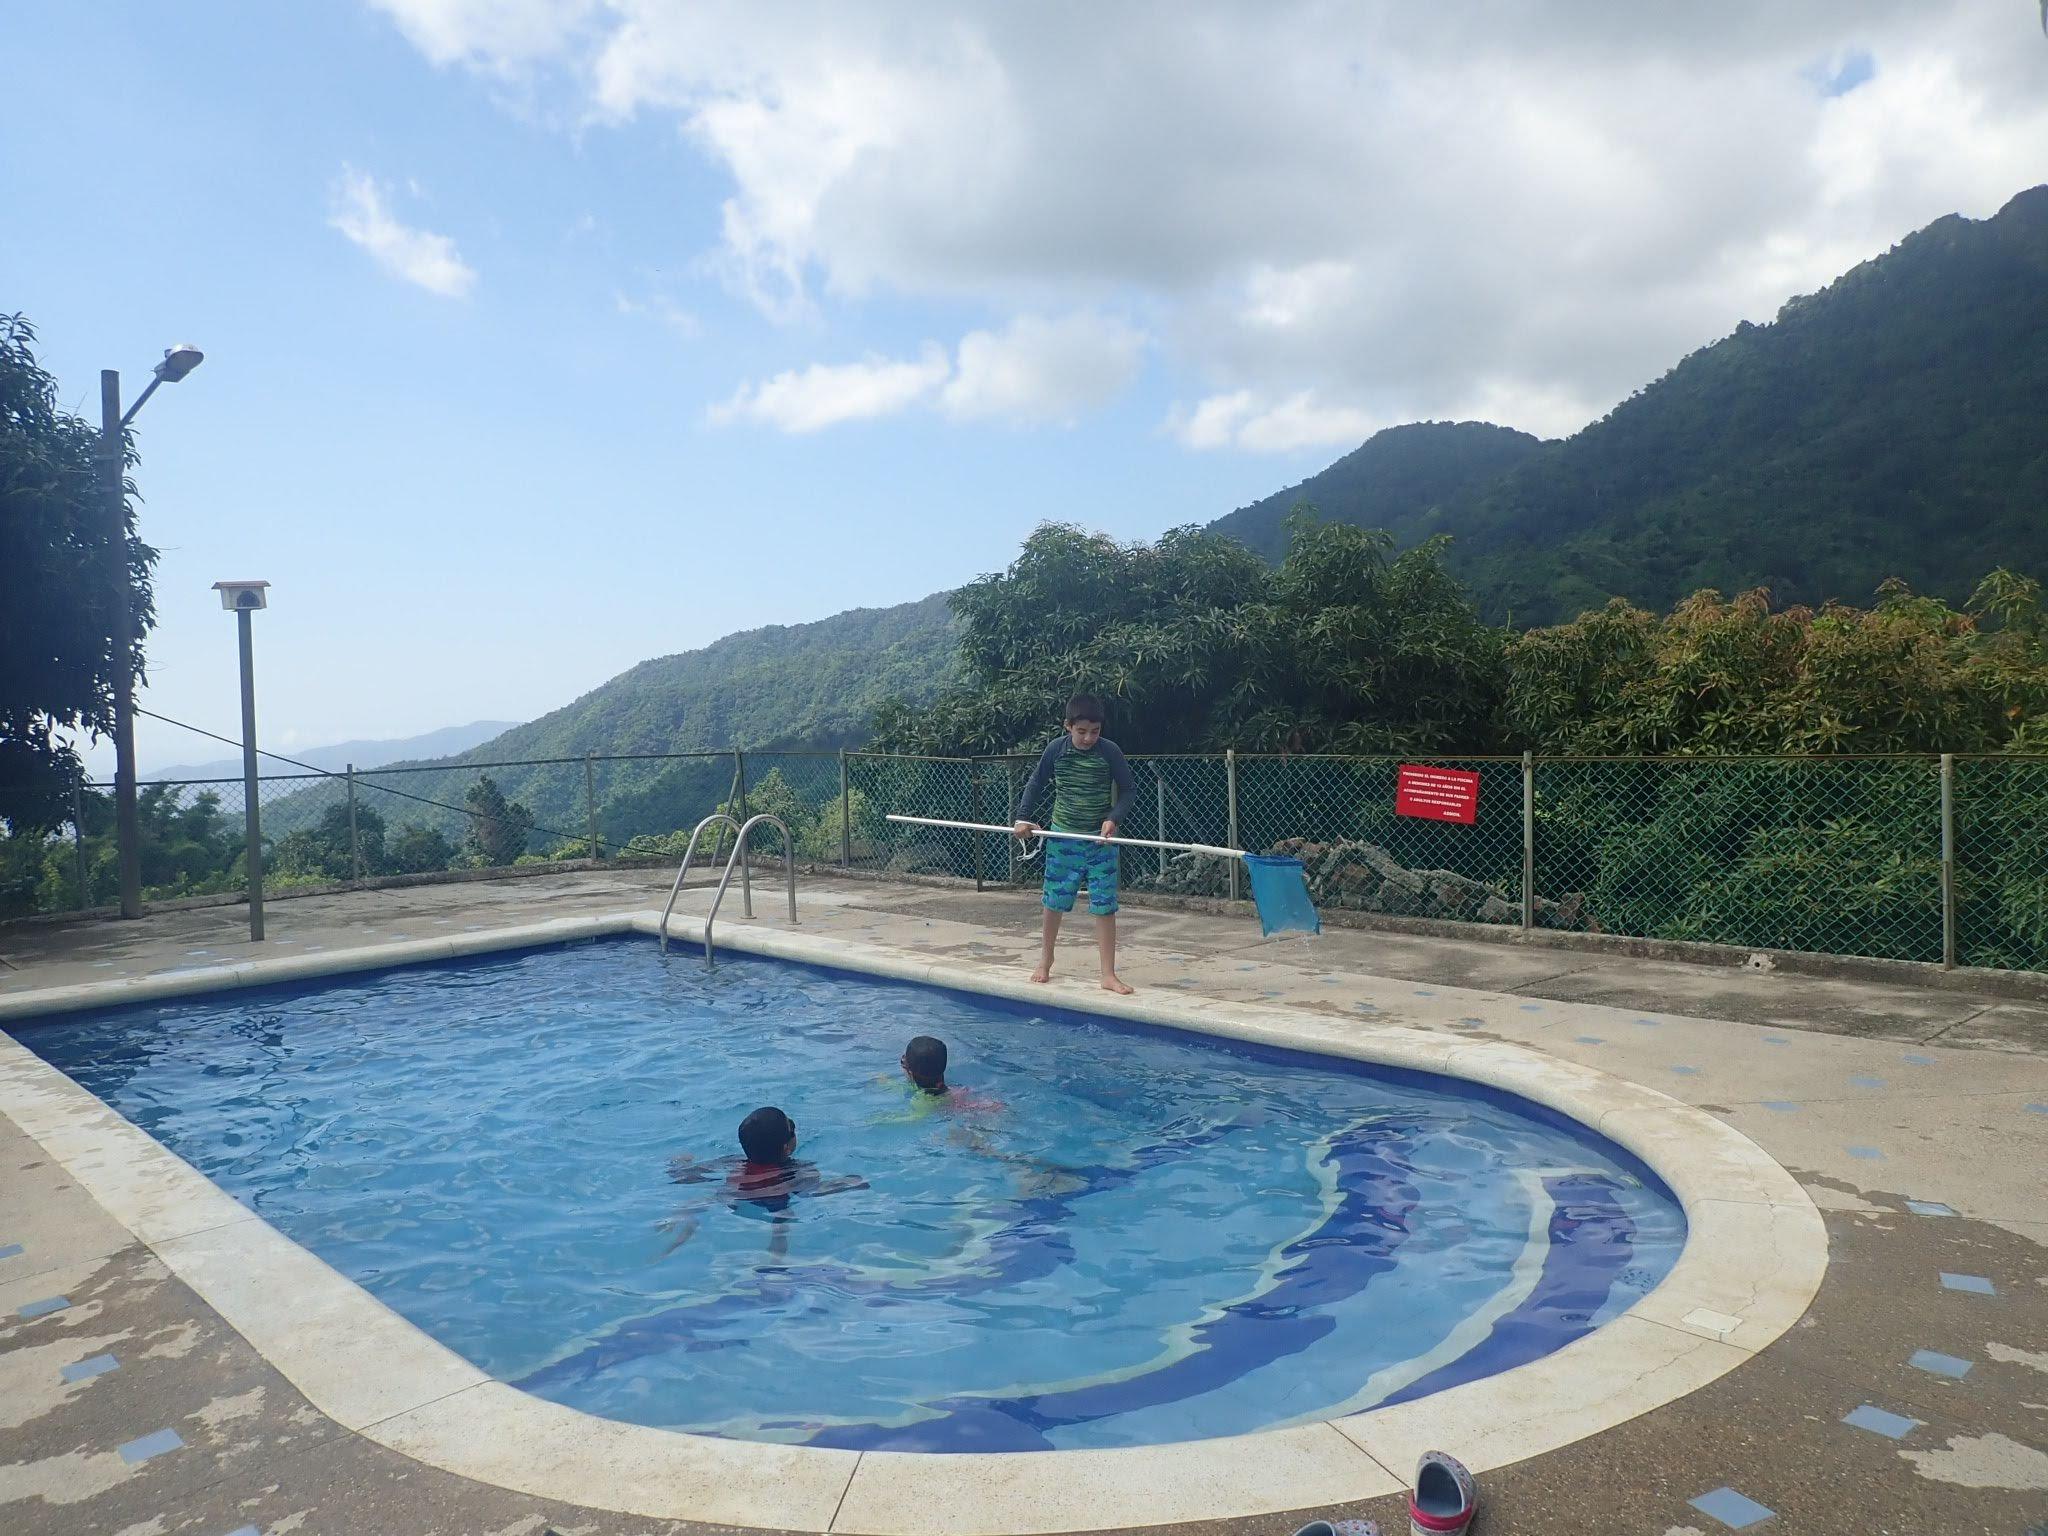 The kids enjoying the pool at Cabanas el Descanso y Zamukia